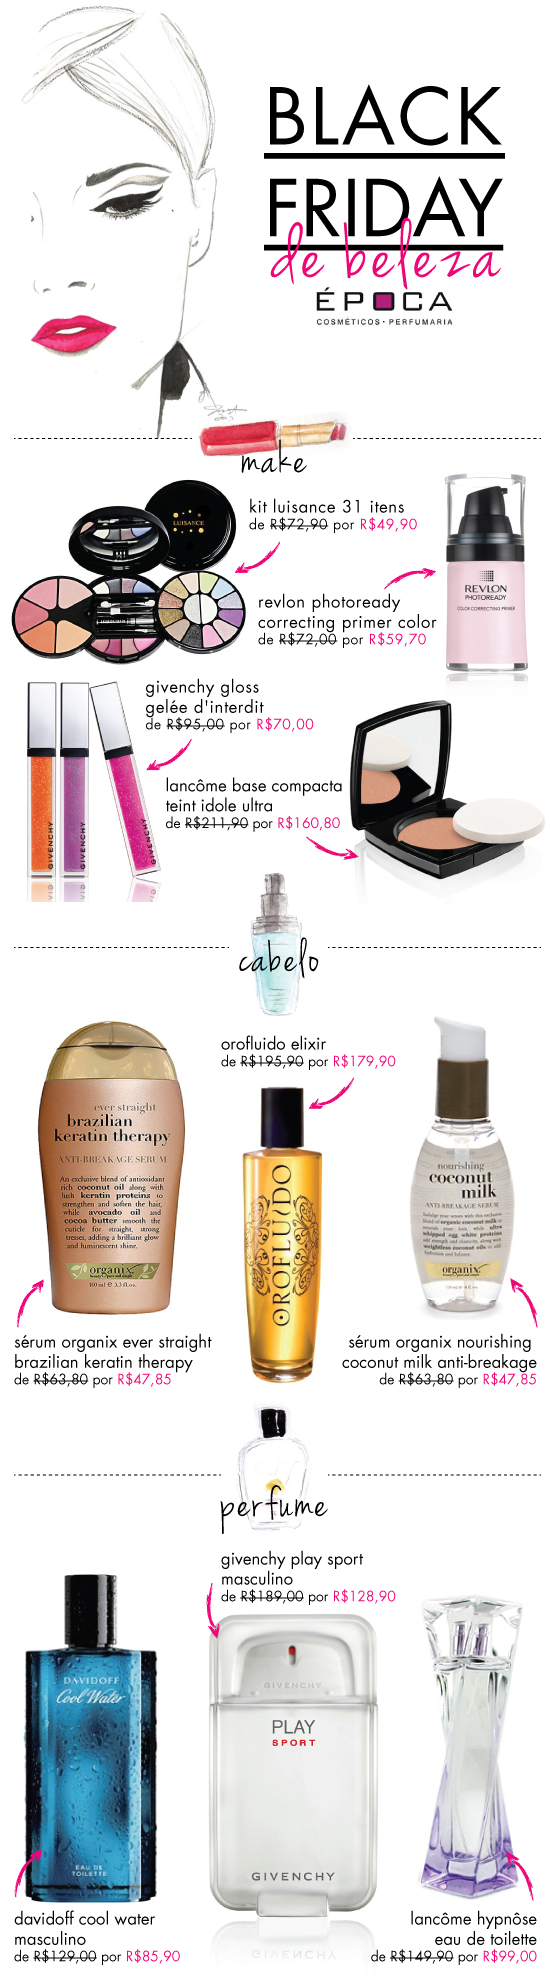 epoca-cosmeticos-black-friday-beleza-site-ecommerce-loja-online-make-maquiagem-cabelo-promocao-desconto-compras-perfume-masculino